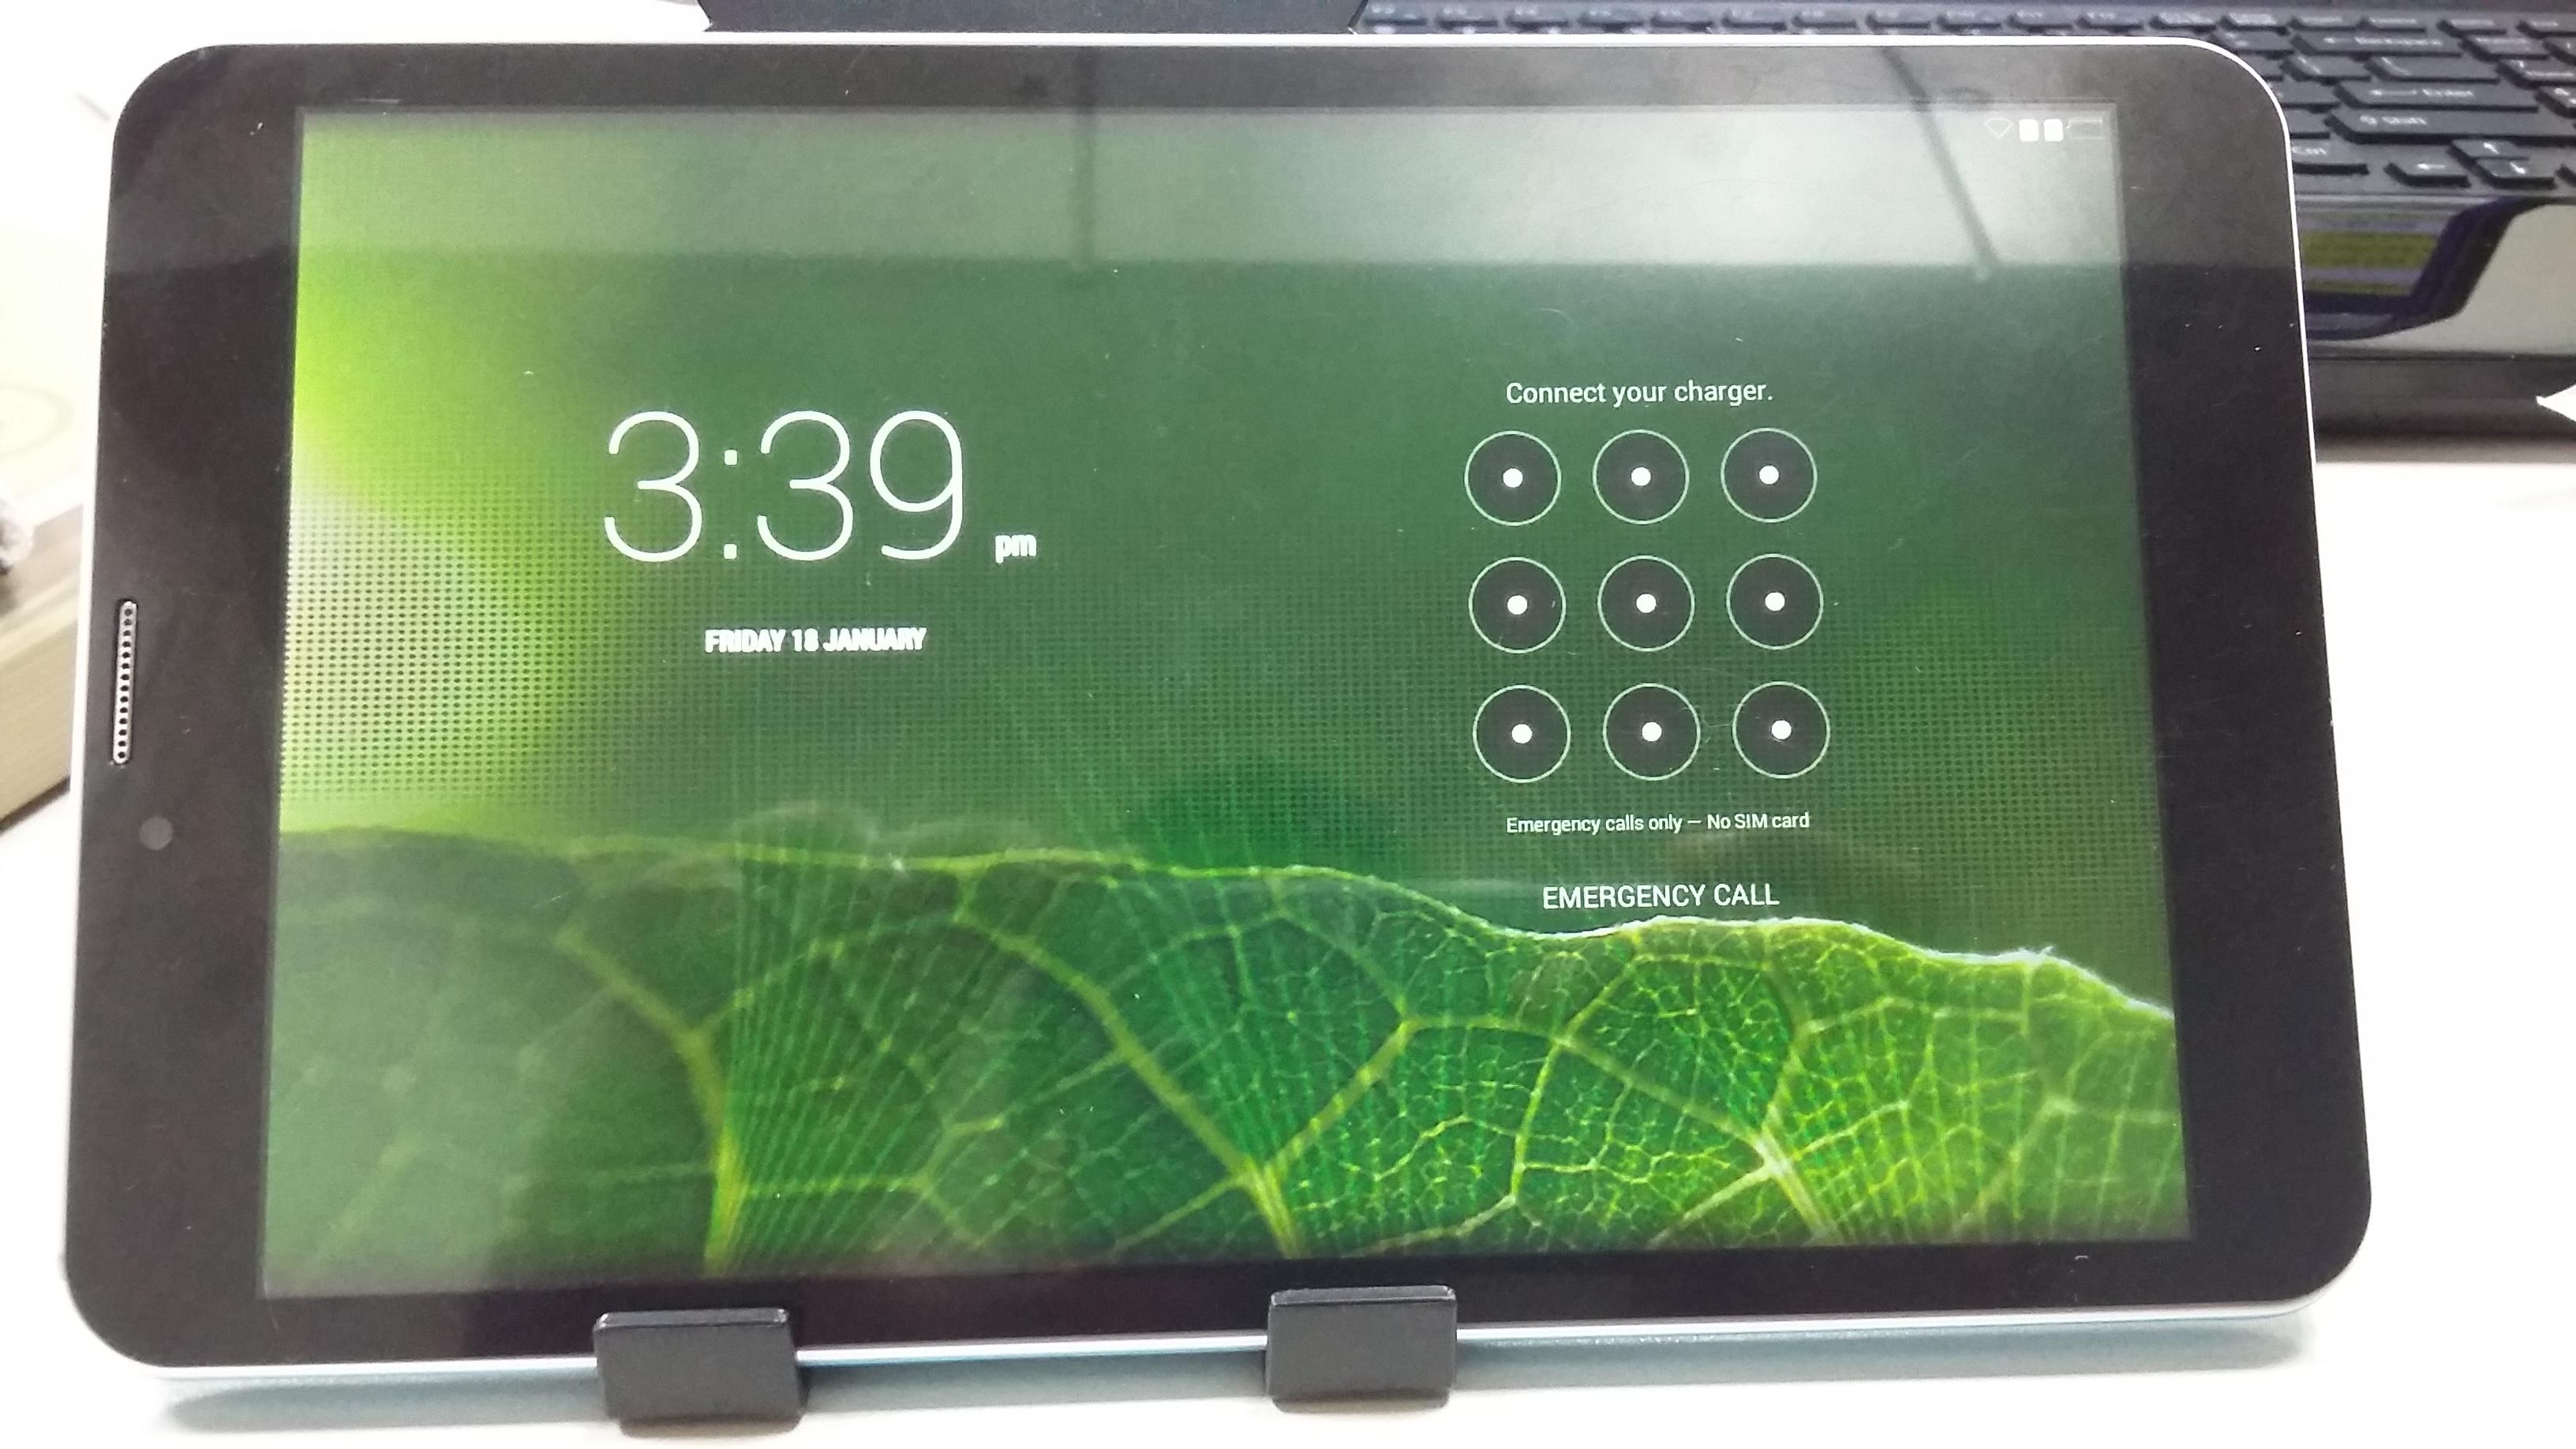 8 Inch 3G Tablet